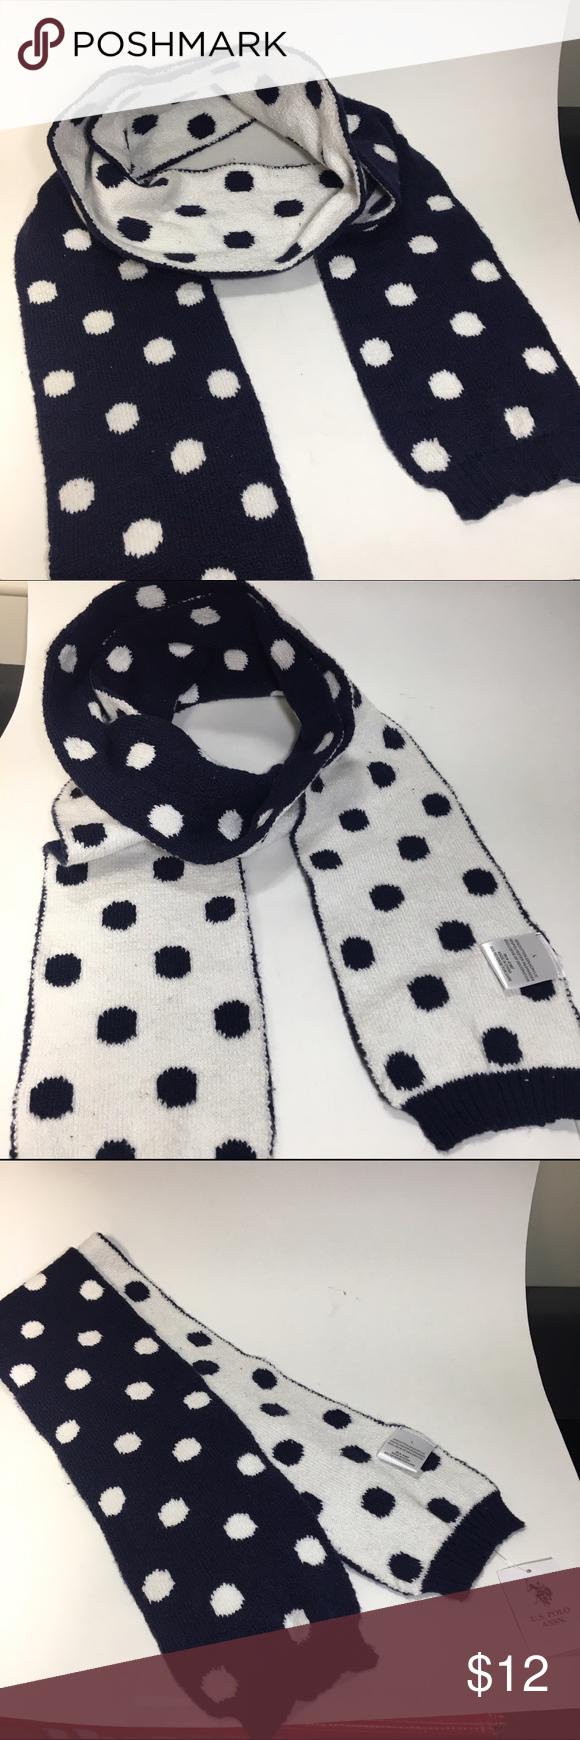 Polo scarf Brand new with tag. Pokadot polo scarf U.S. Polo Assn. Accessories Scarves & Wraps